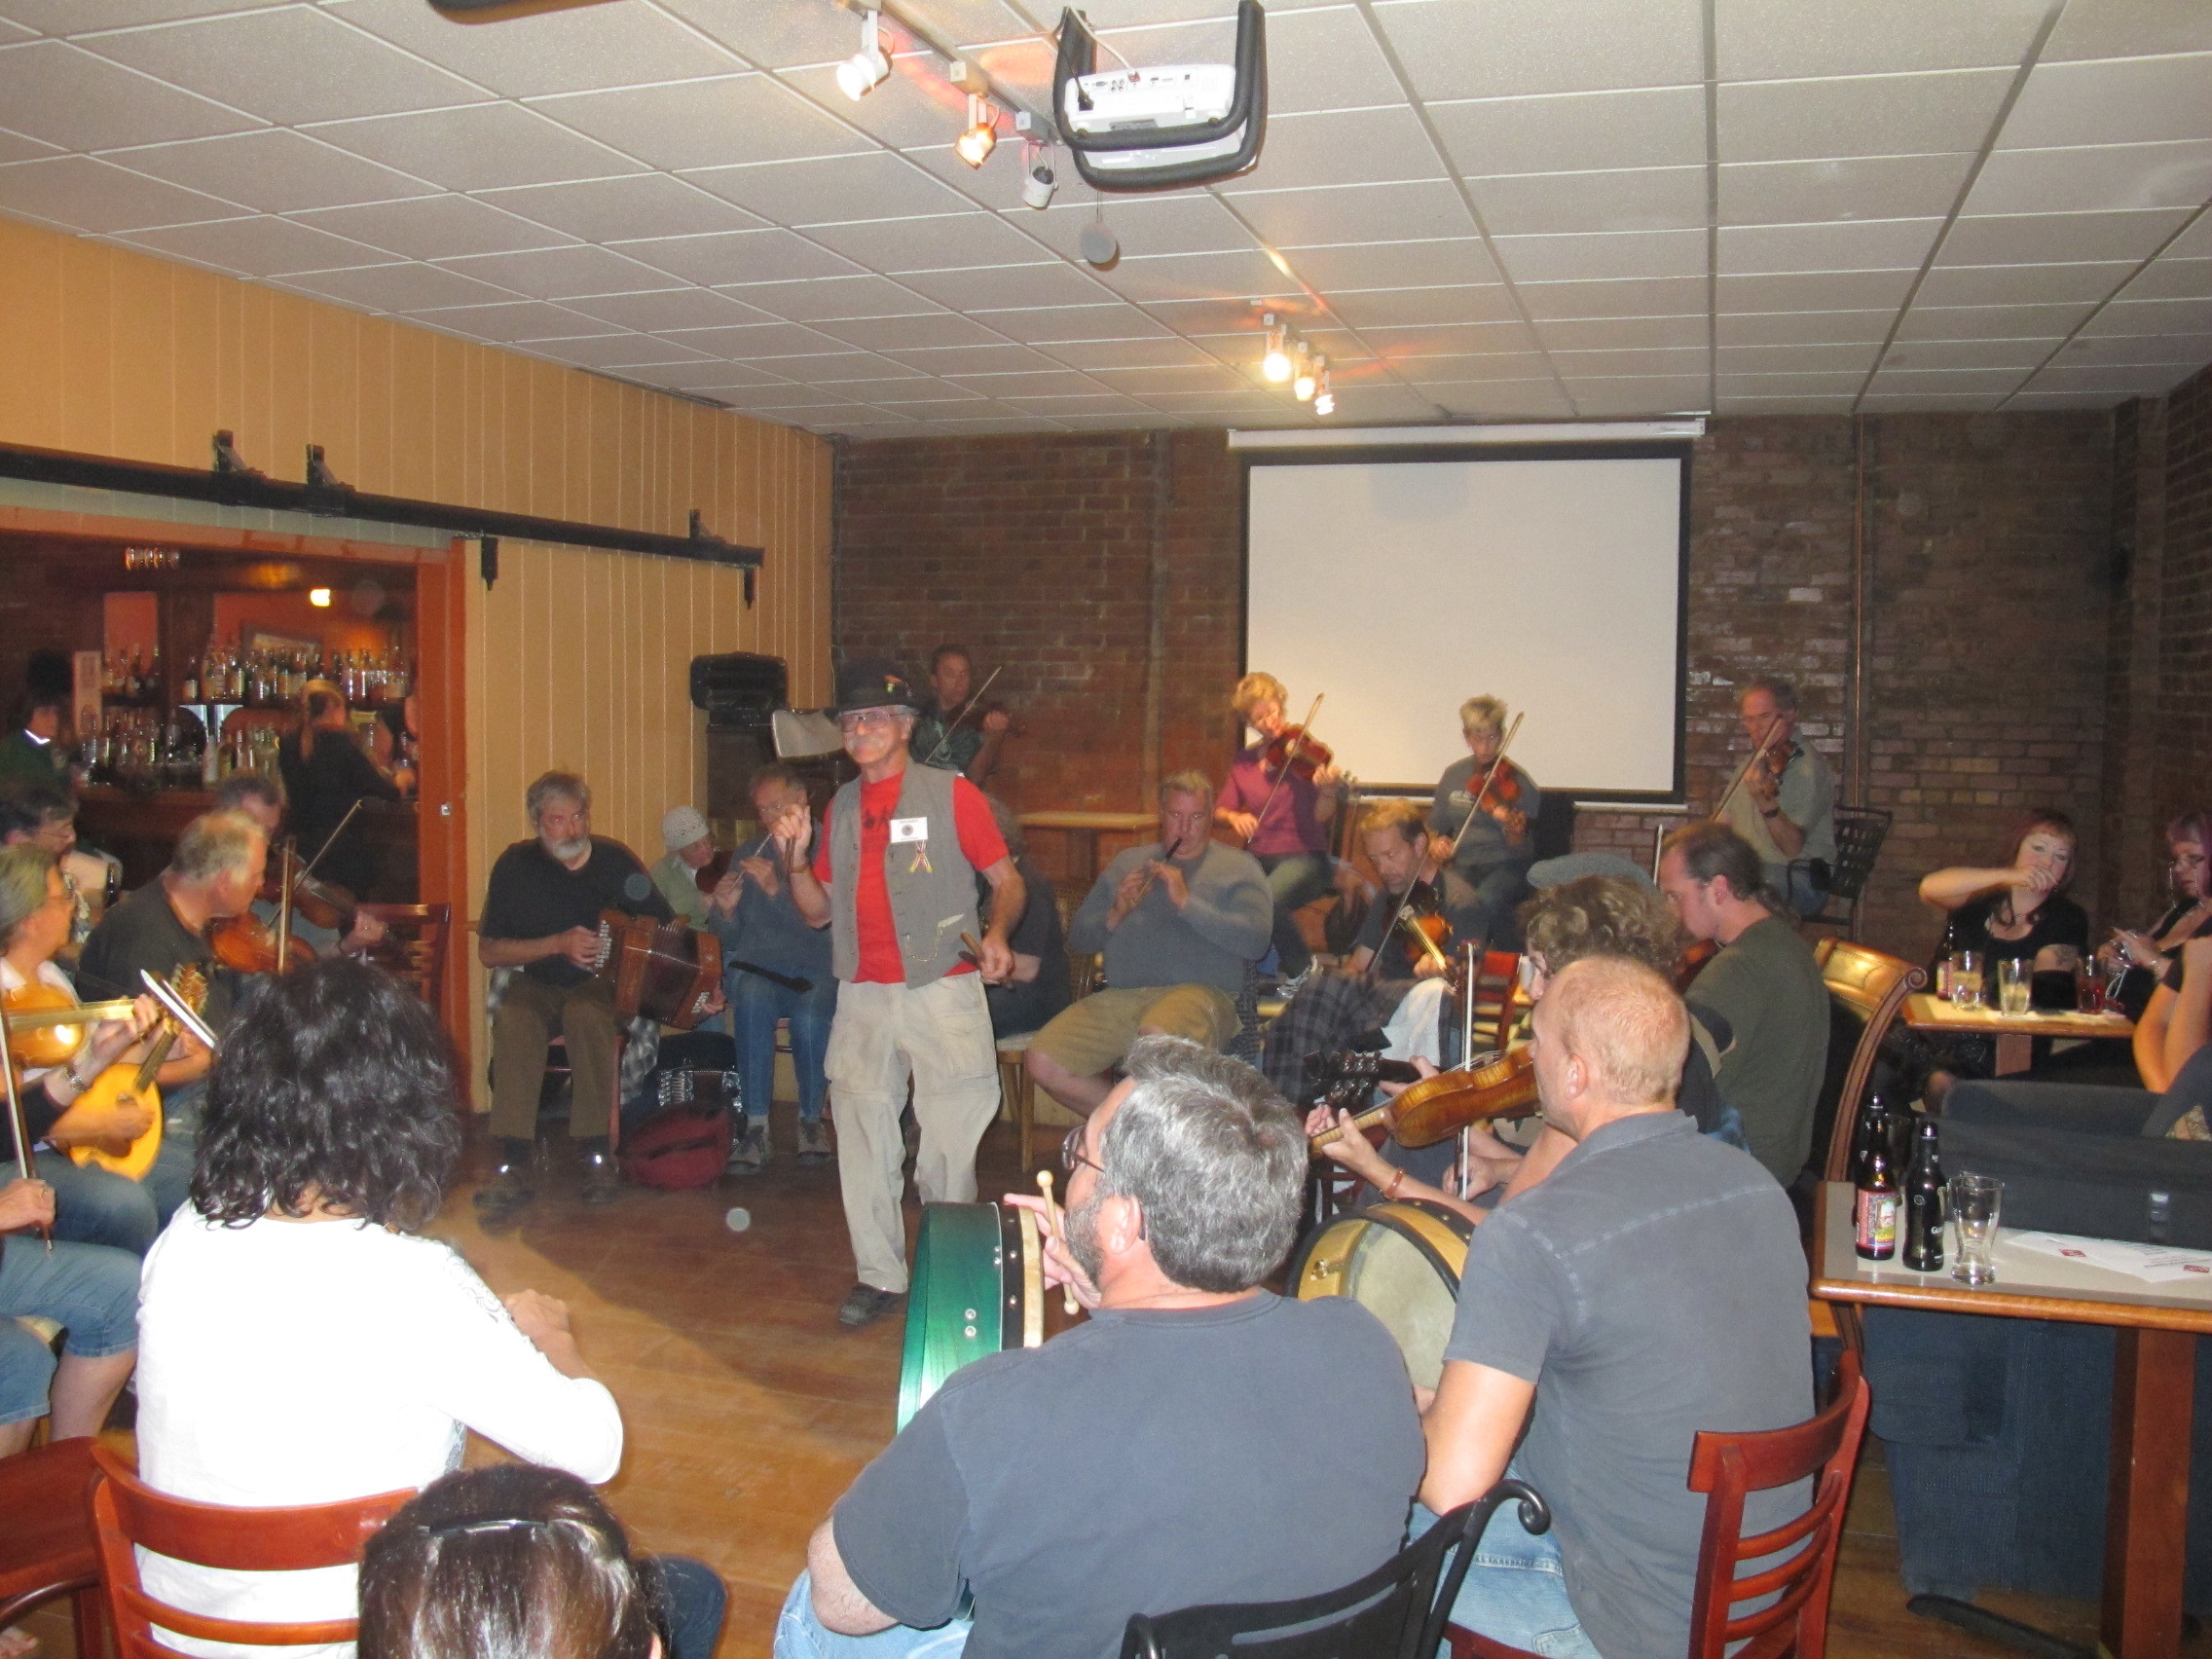 SPF11 Session at THE HUB La Veta Inn